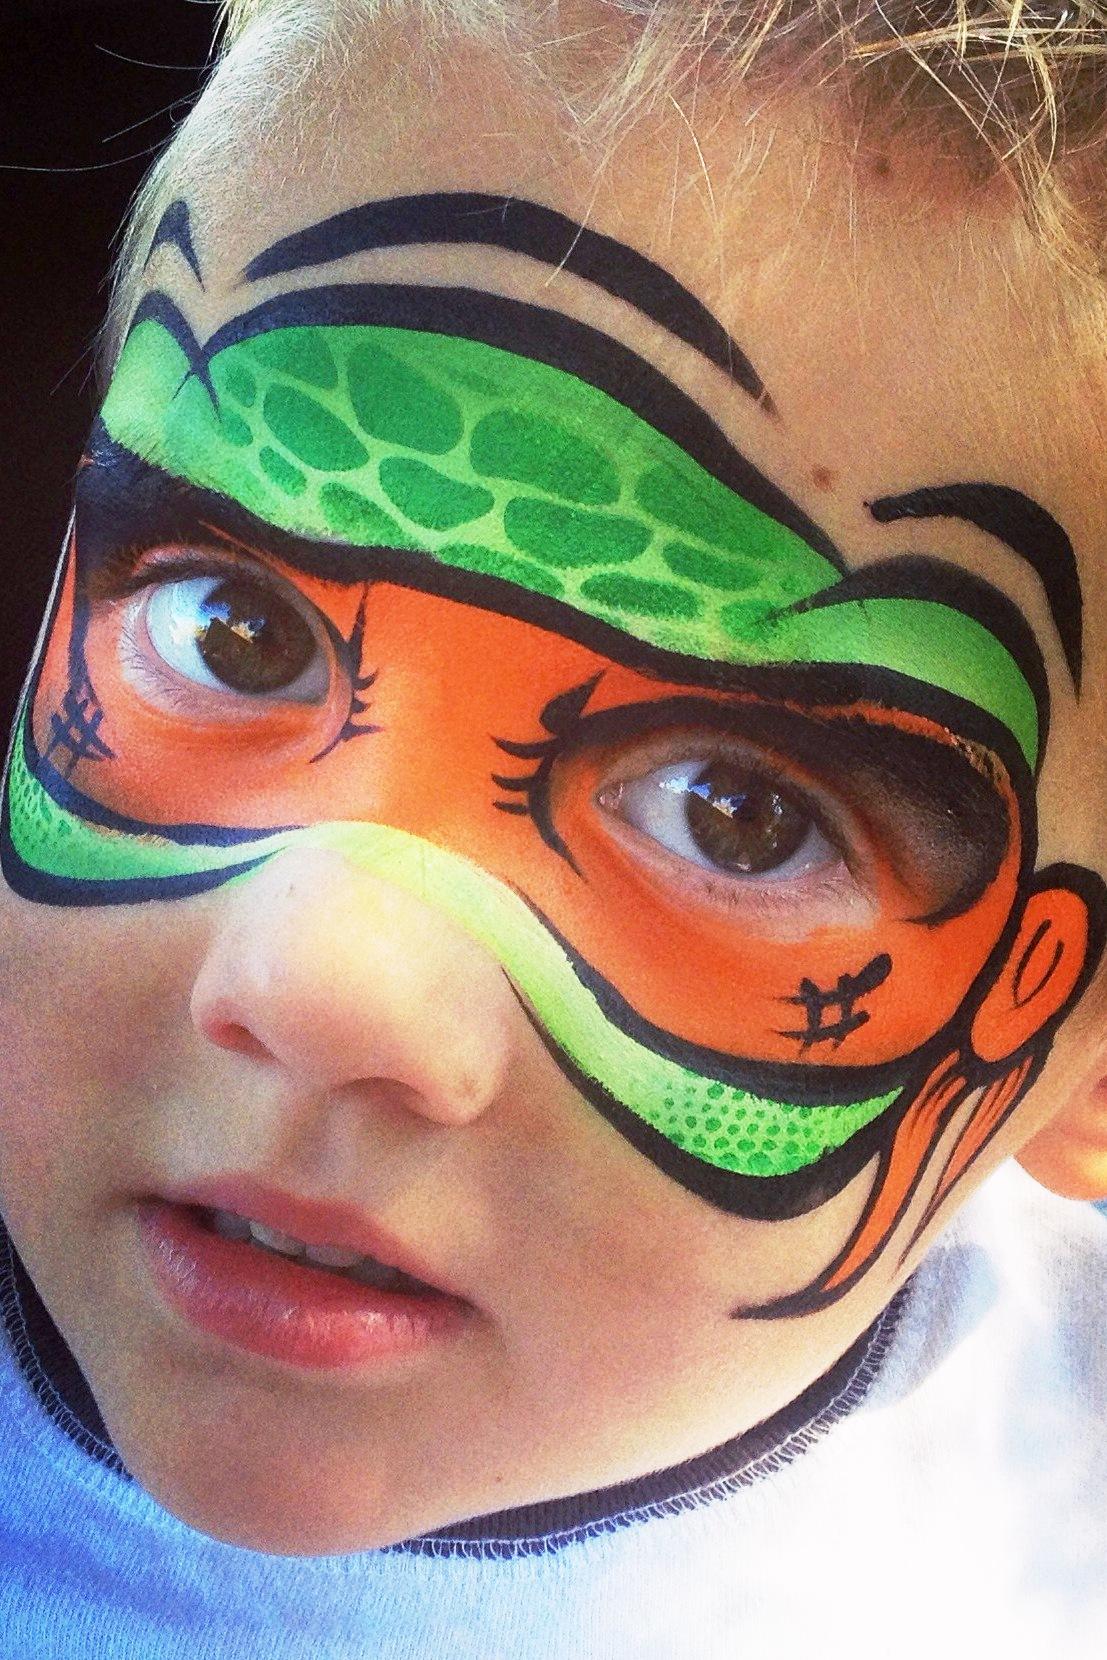 Michelangelo TMNT mask, Face Painting, Ninja Turtles, Yuba City face painter, Yuba. Sutter, Colusa, Butte, California, Orange mask, blue mask, purple mask, red mask